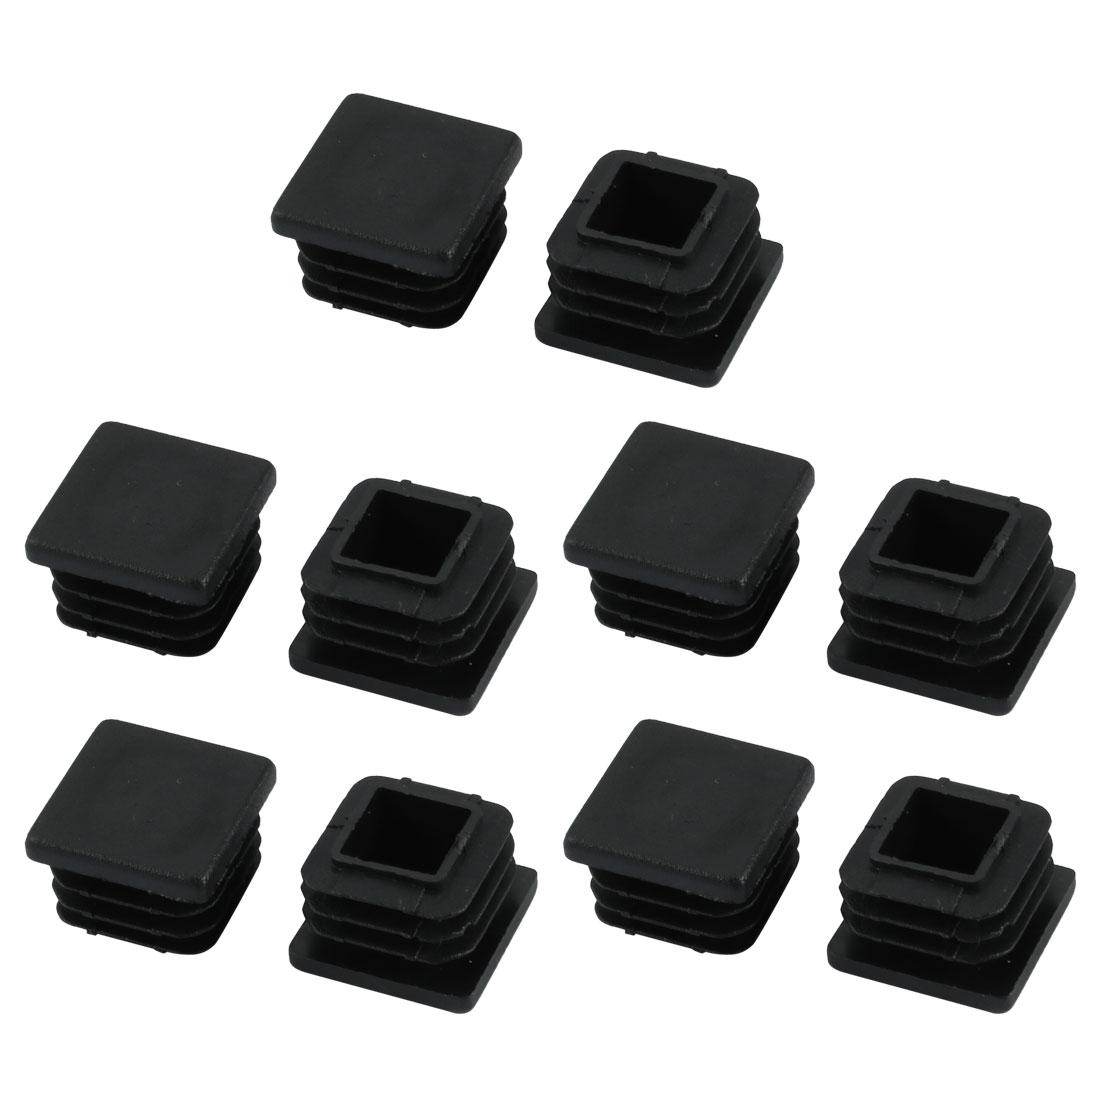 10pcs Furniture Legs Protector Plastic Square Tube Inserts Cap Black 20mm x 20mm